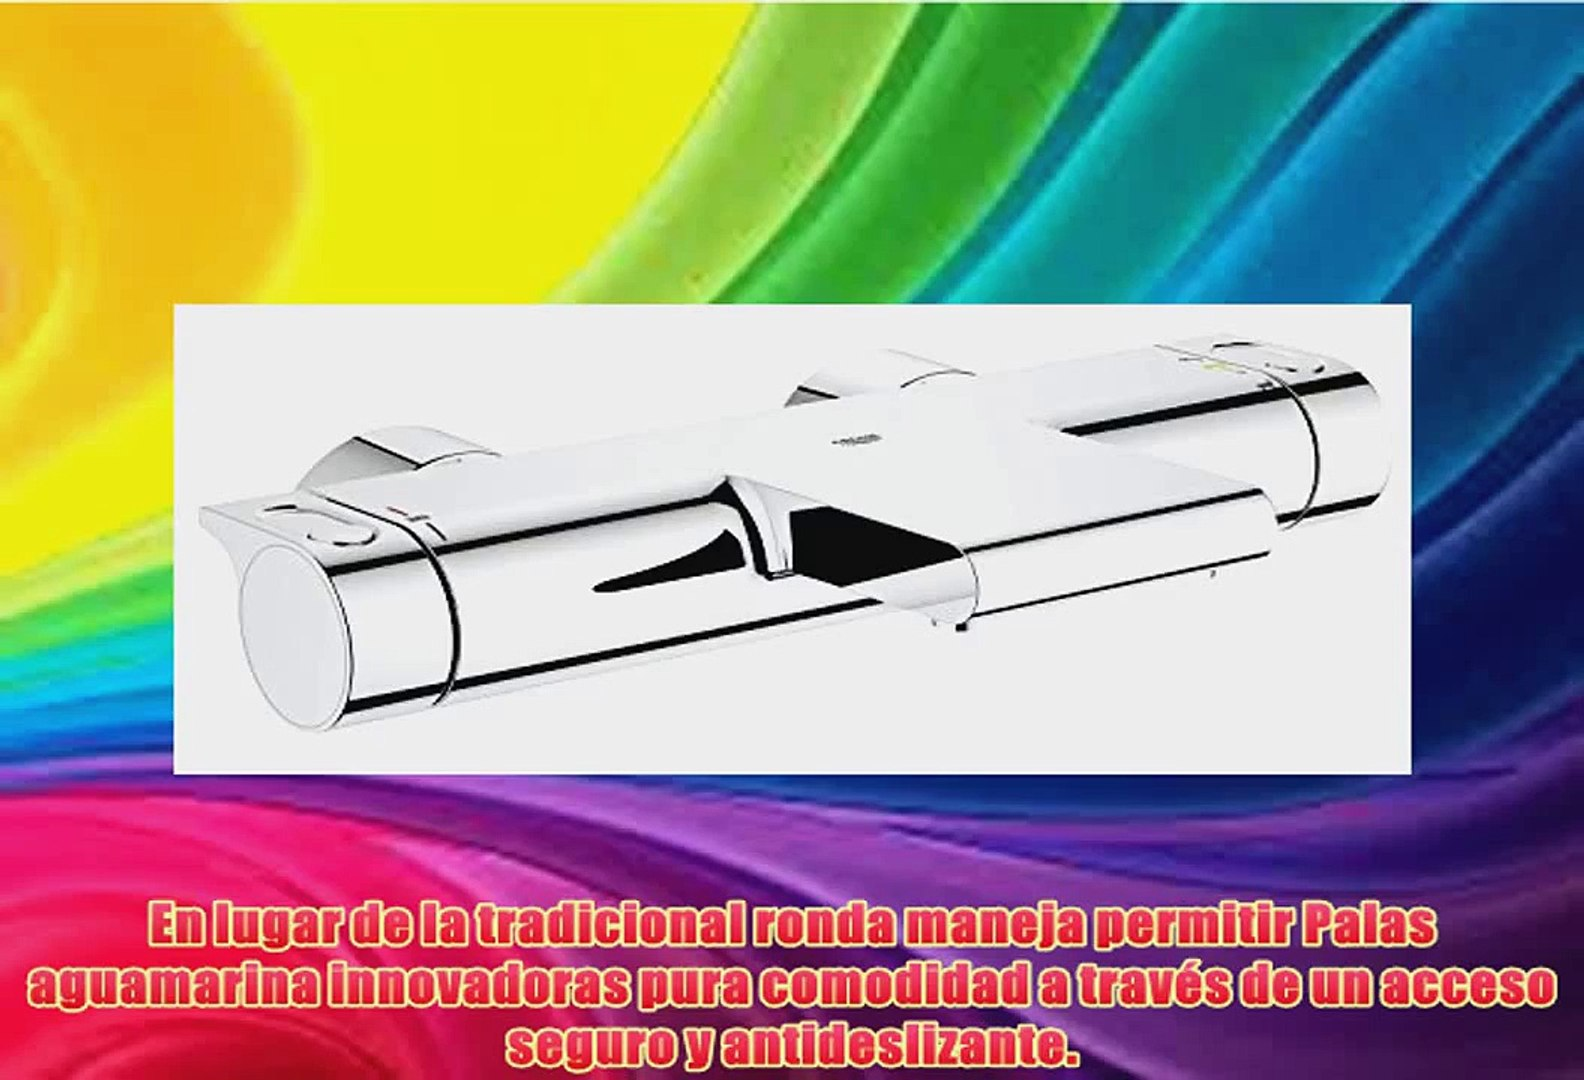 Festnight Aibecy M3 Screw Leveling Spring Knob Suite Componente de nivelaci/ón para impresoras 3D Lecho caliente//Plataforma Paquete de 5 juegos